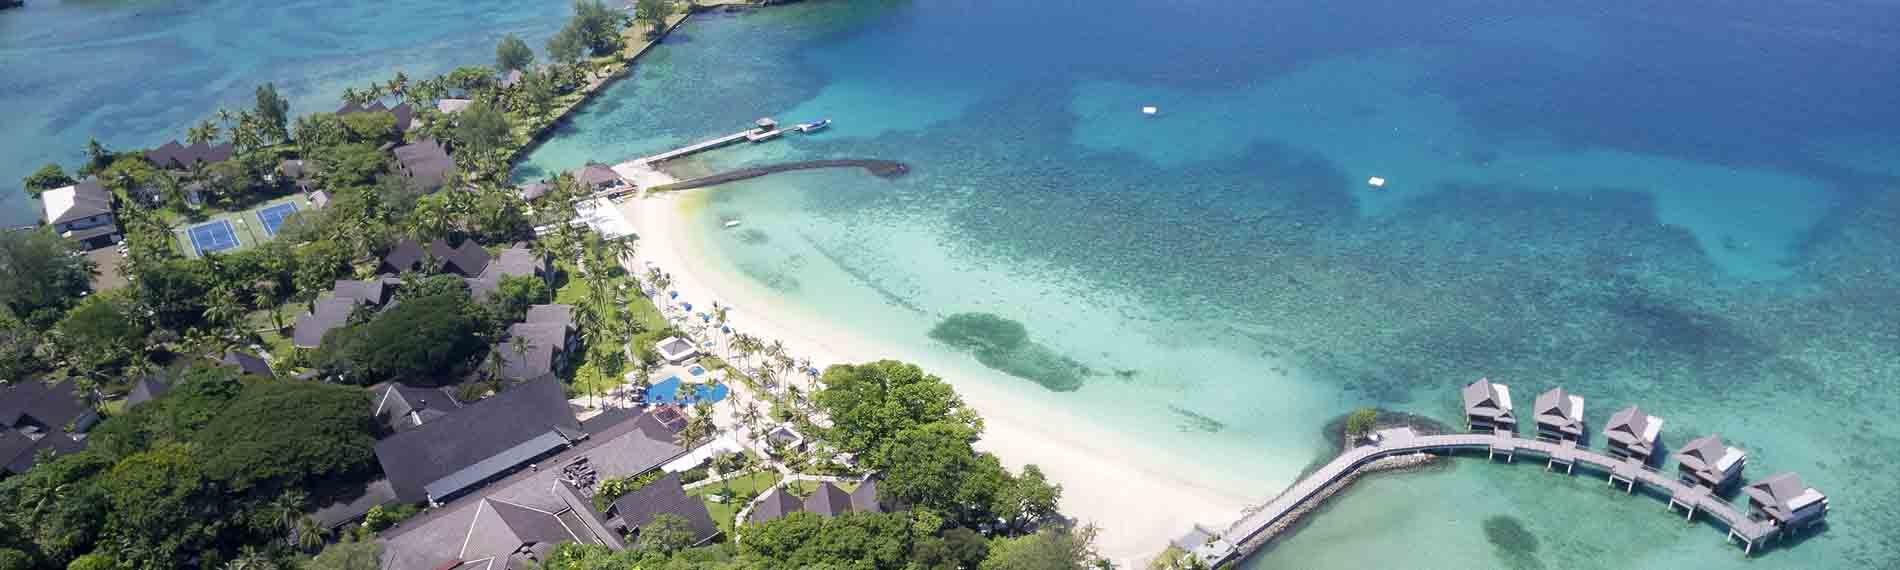 Mikronesien Palau Palau Palau Pacific Resort Tauchreisen